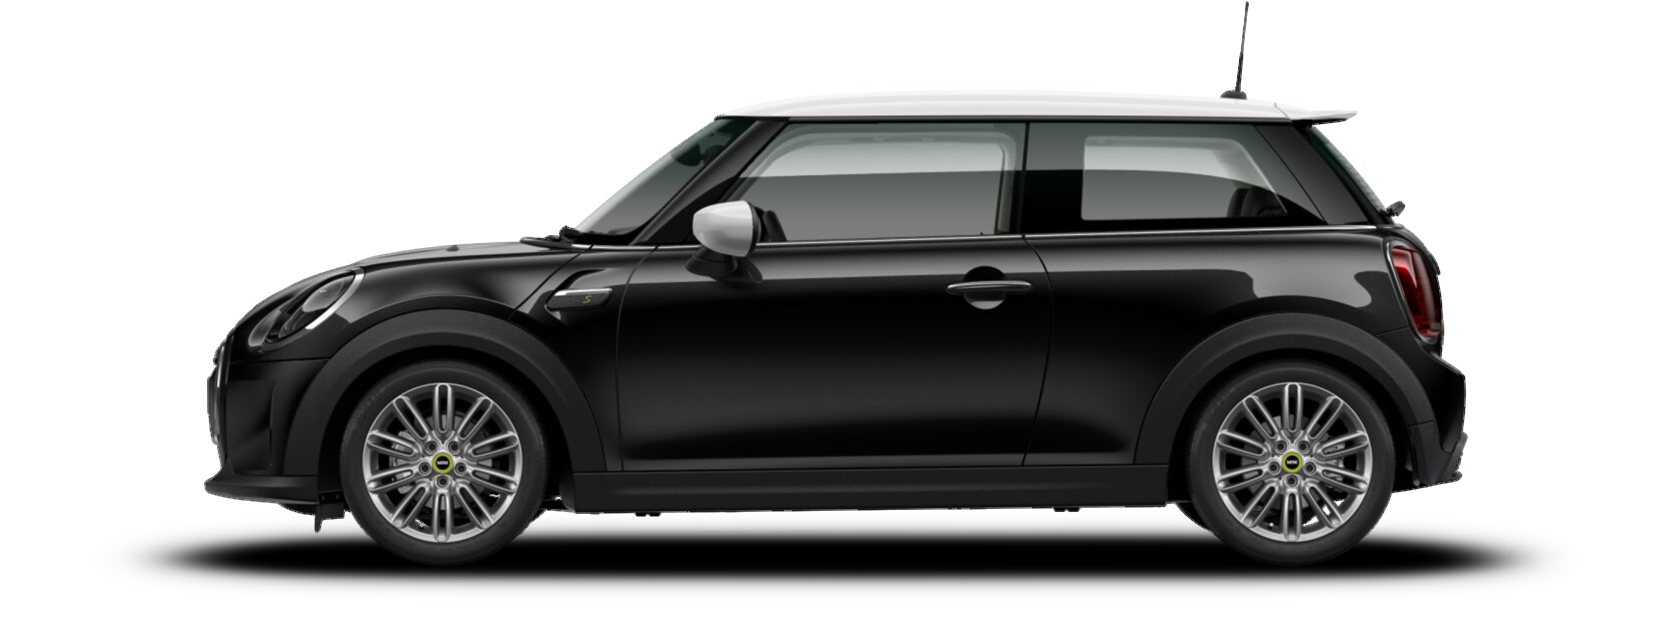 MINI Electric Hatchback